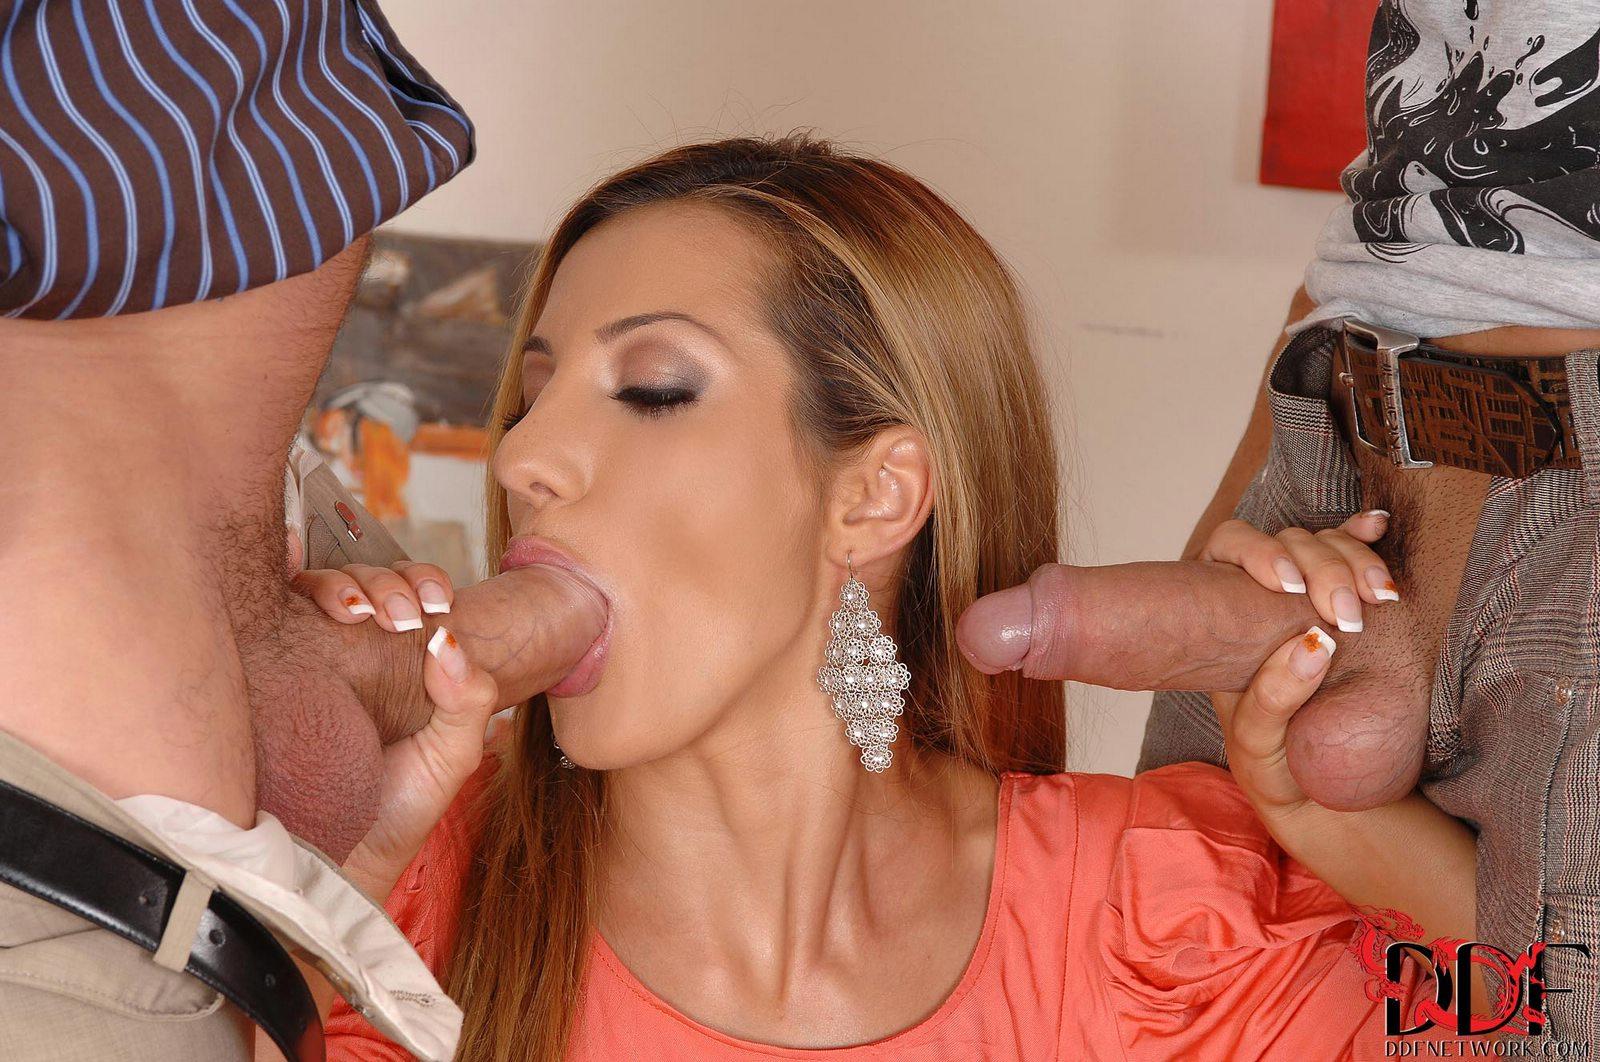 Alice romain double penetration - 2 10